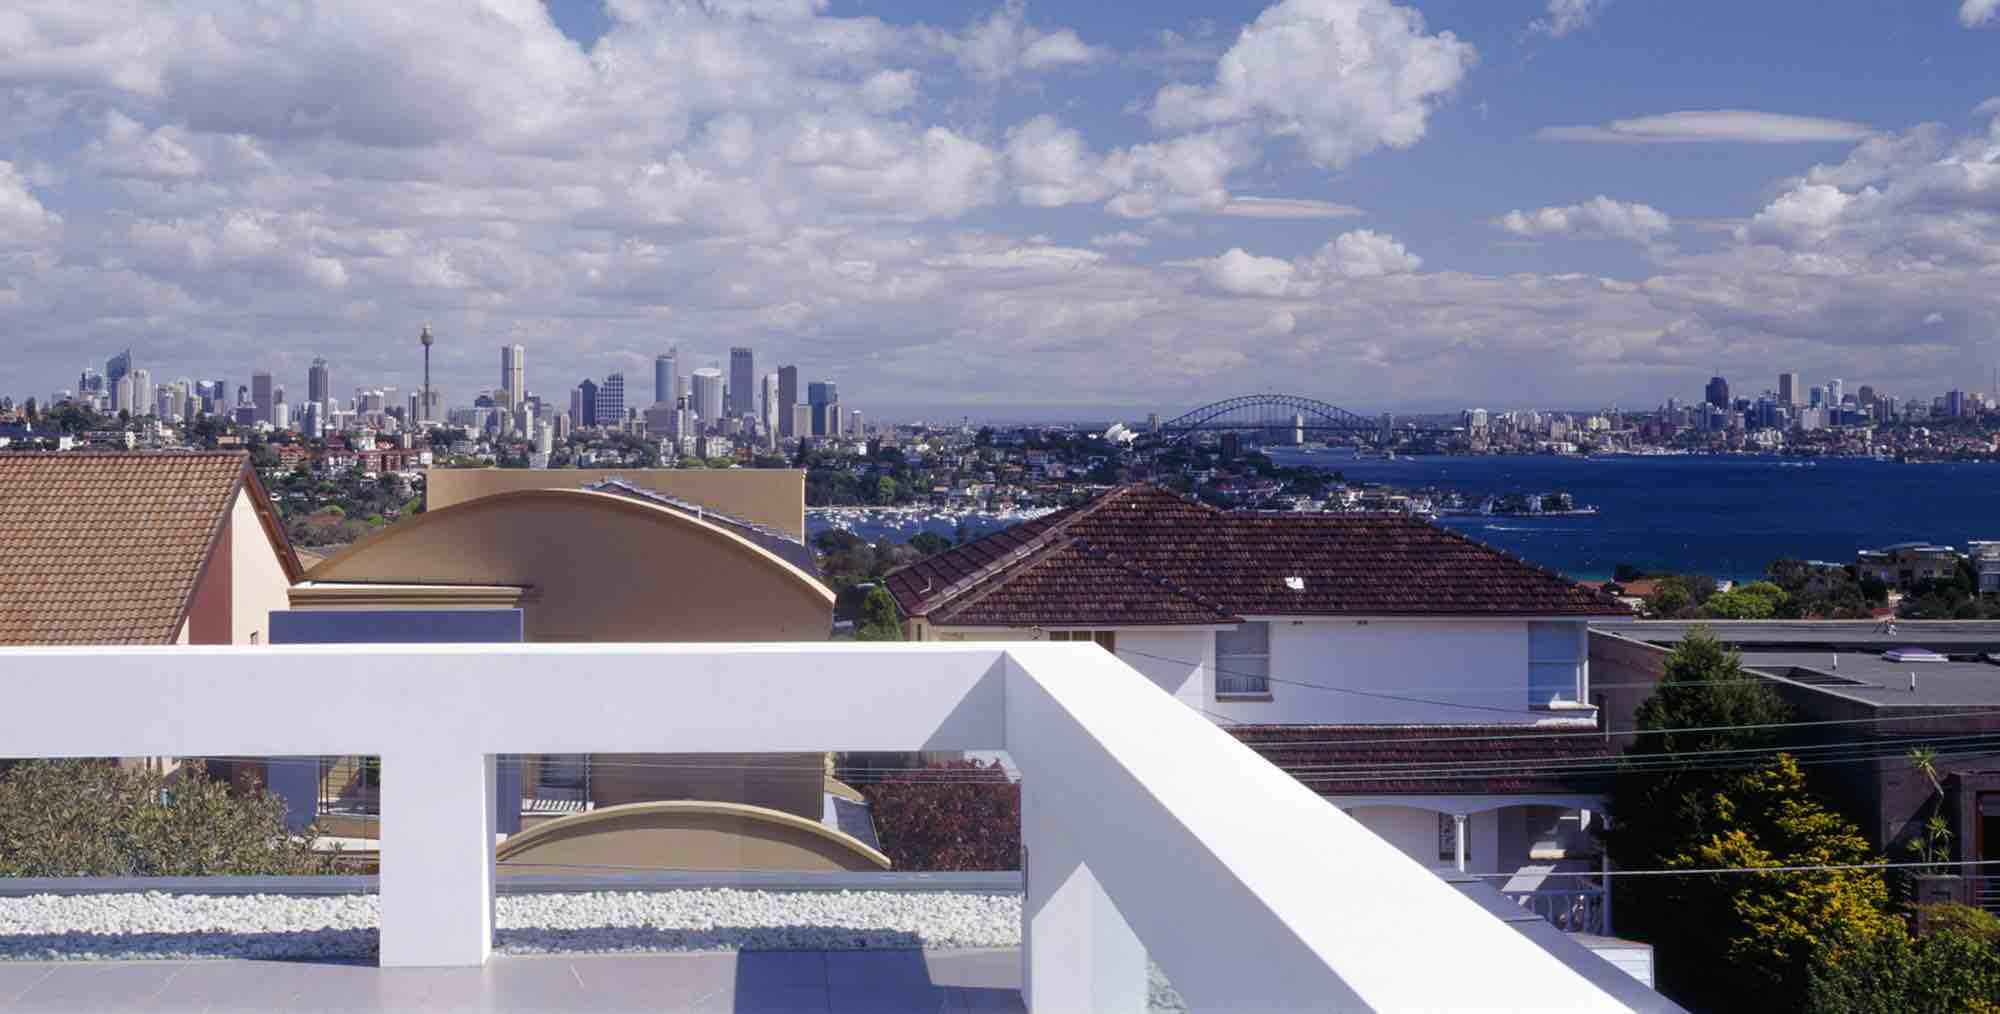 minosa-design-high-voids-sitting-room-modern-custom-joinery-gas-fireplace-limestone-floor-sydney-skyline-view-01